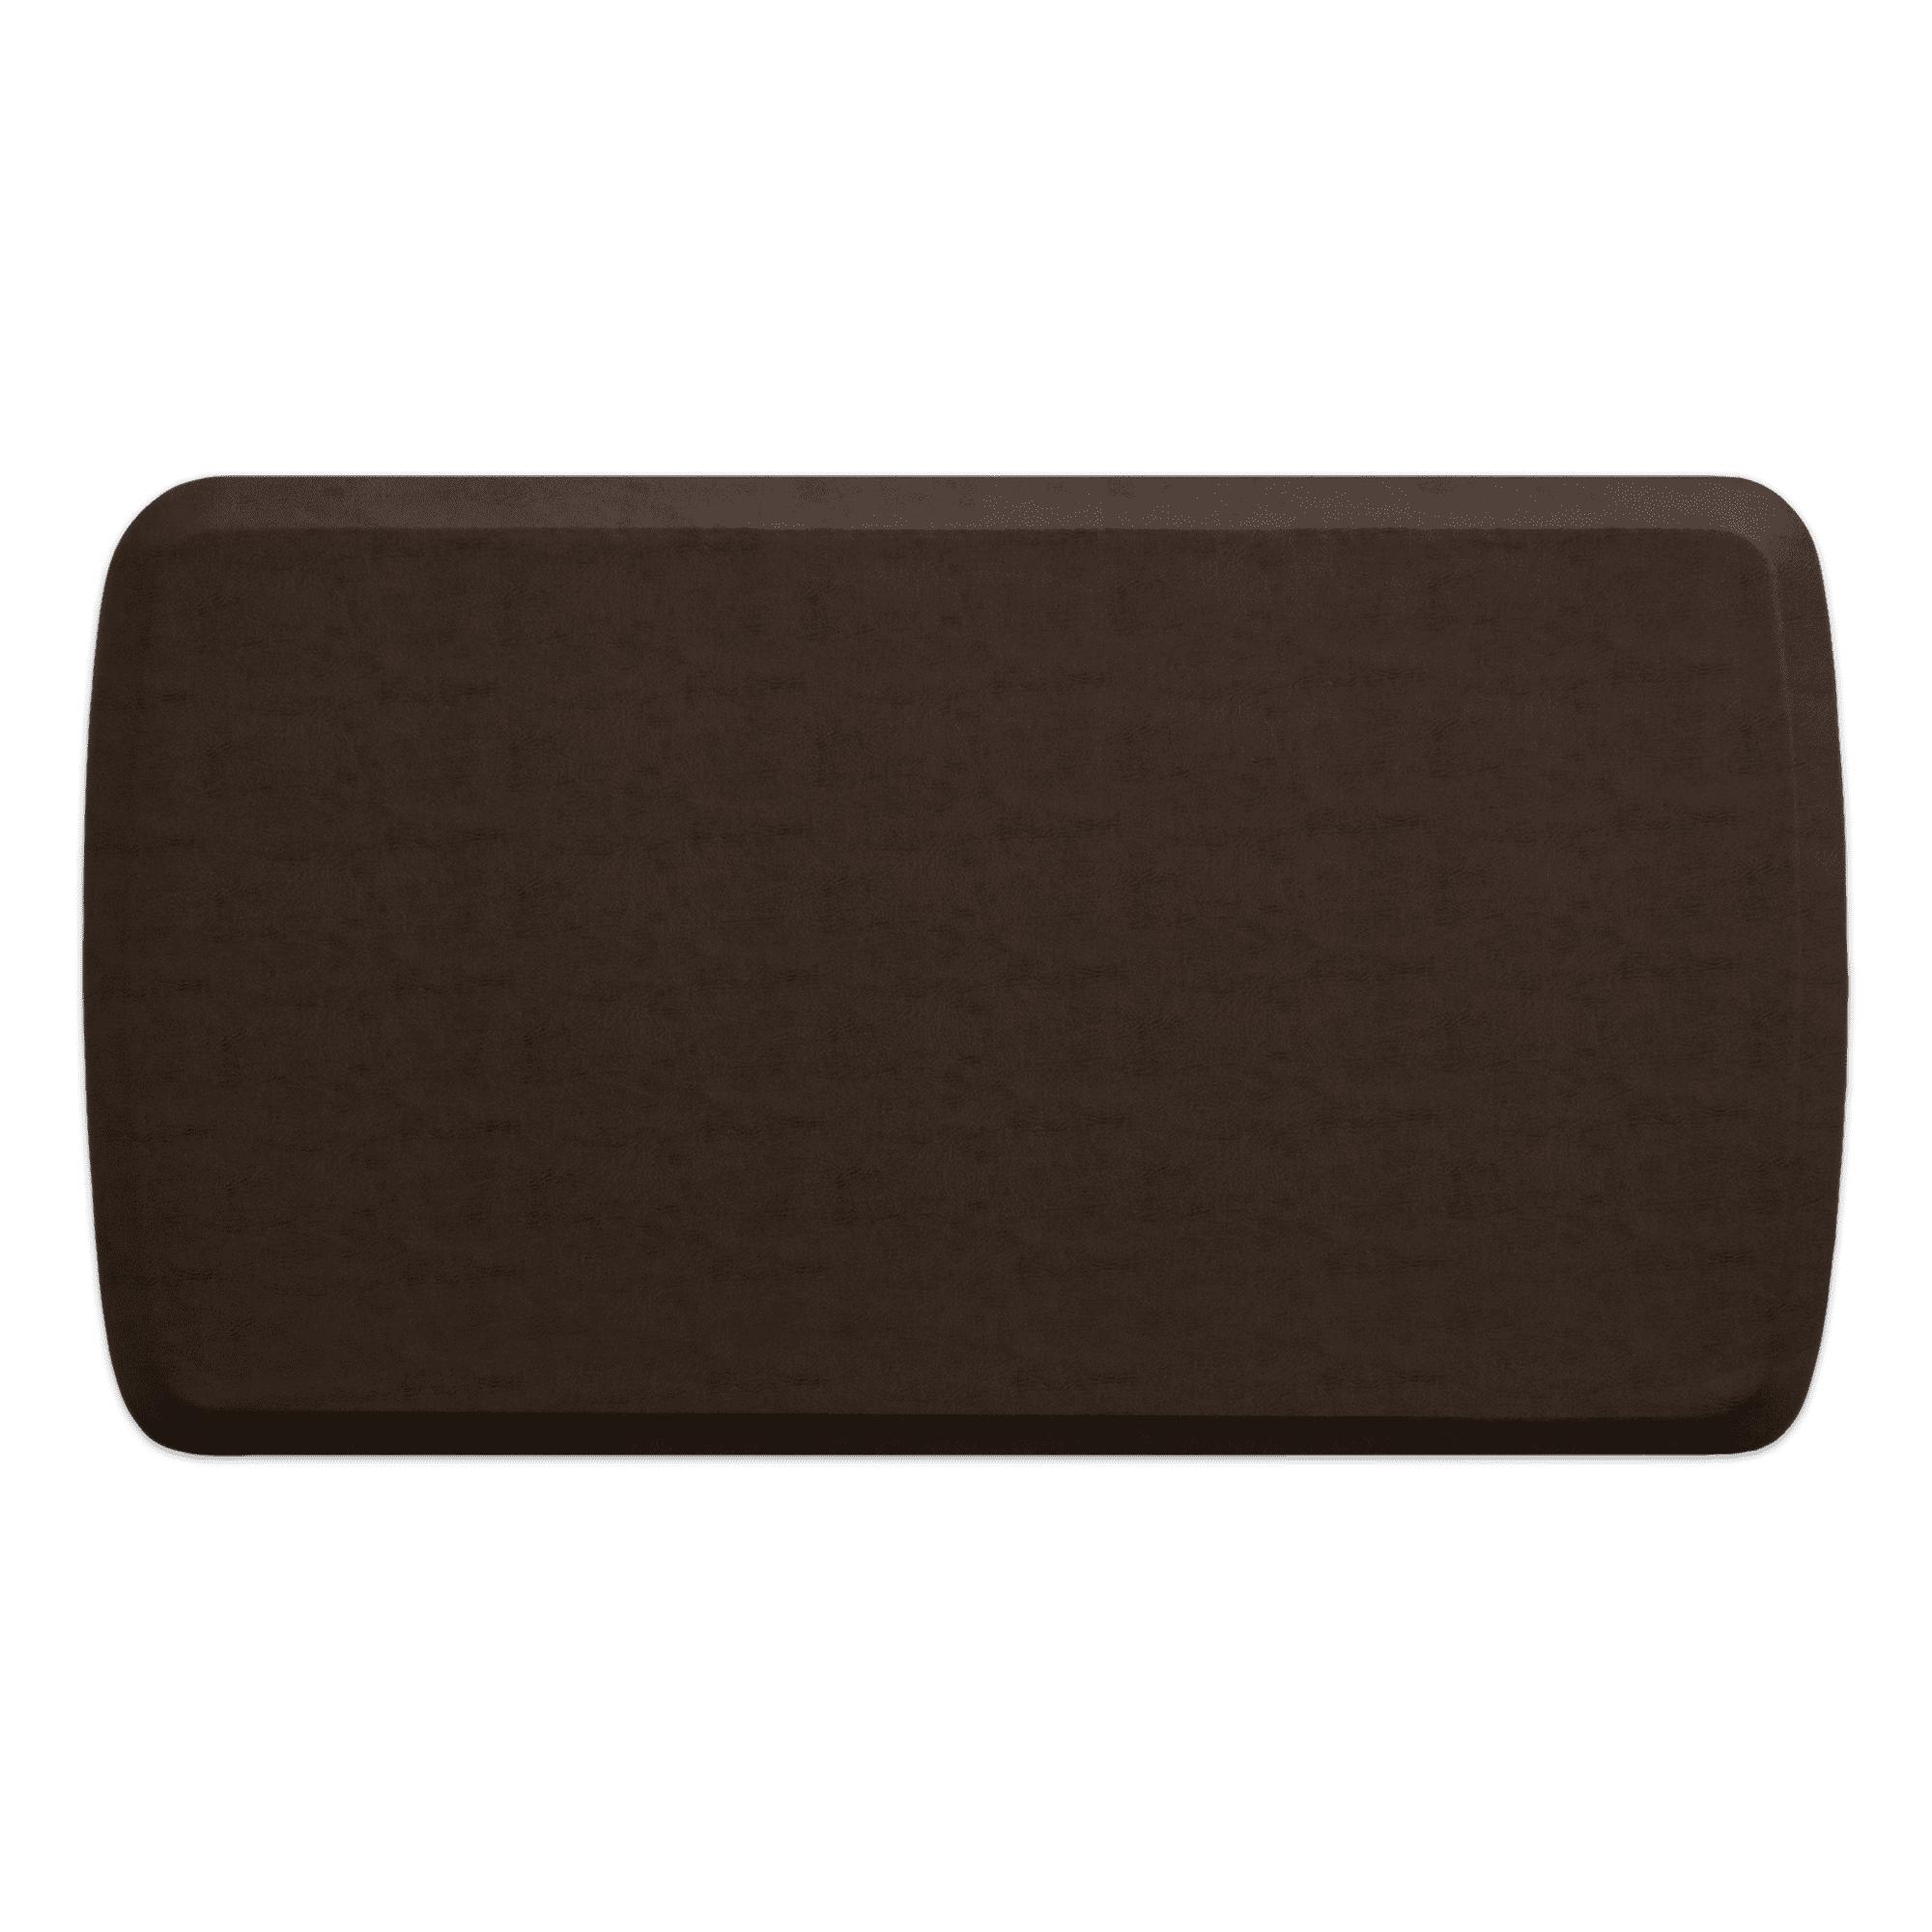 "GelPro Elite Anti-Fatigue Kitchen Comfort Floor Mat - 20x36"" - Vintage Leather Slate"